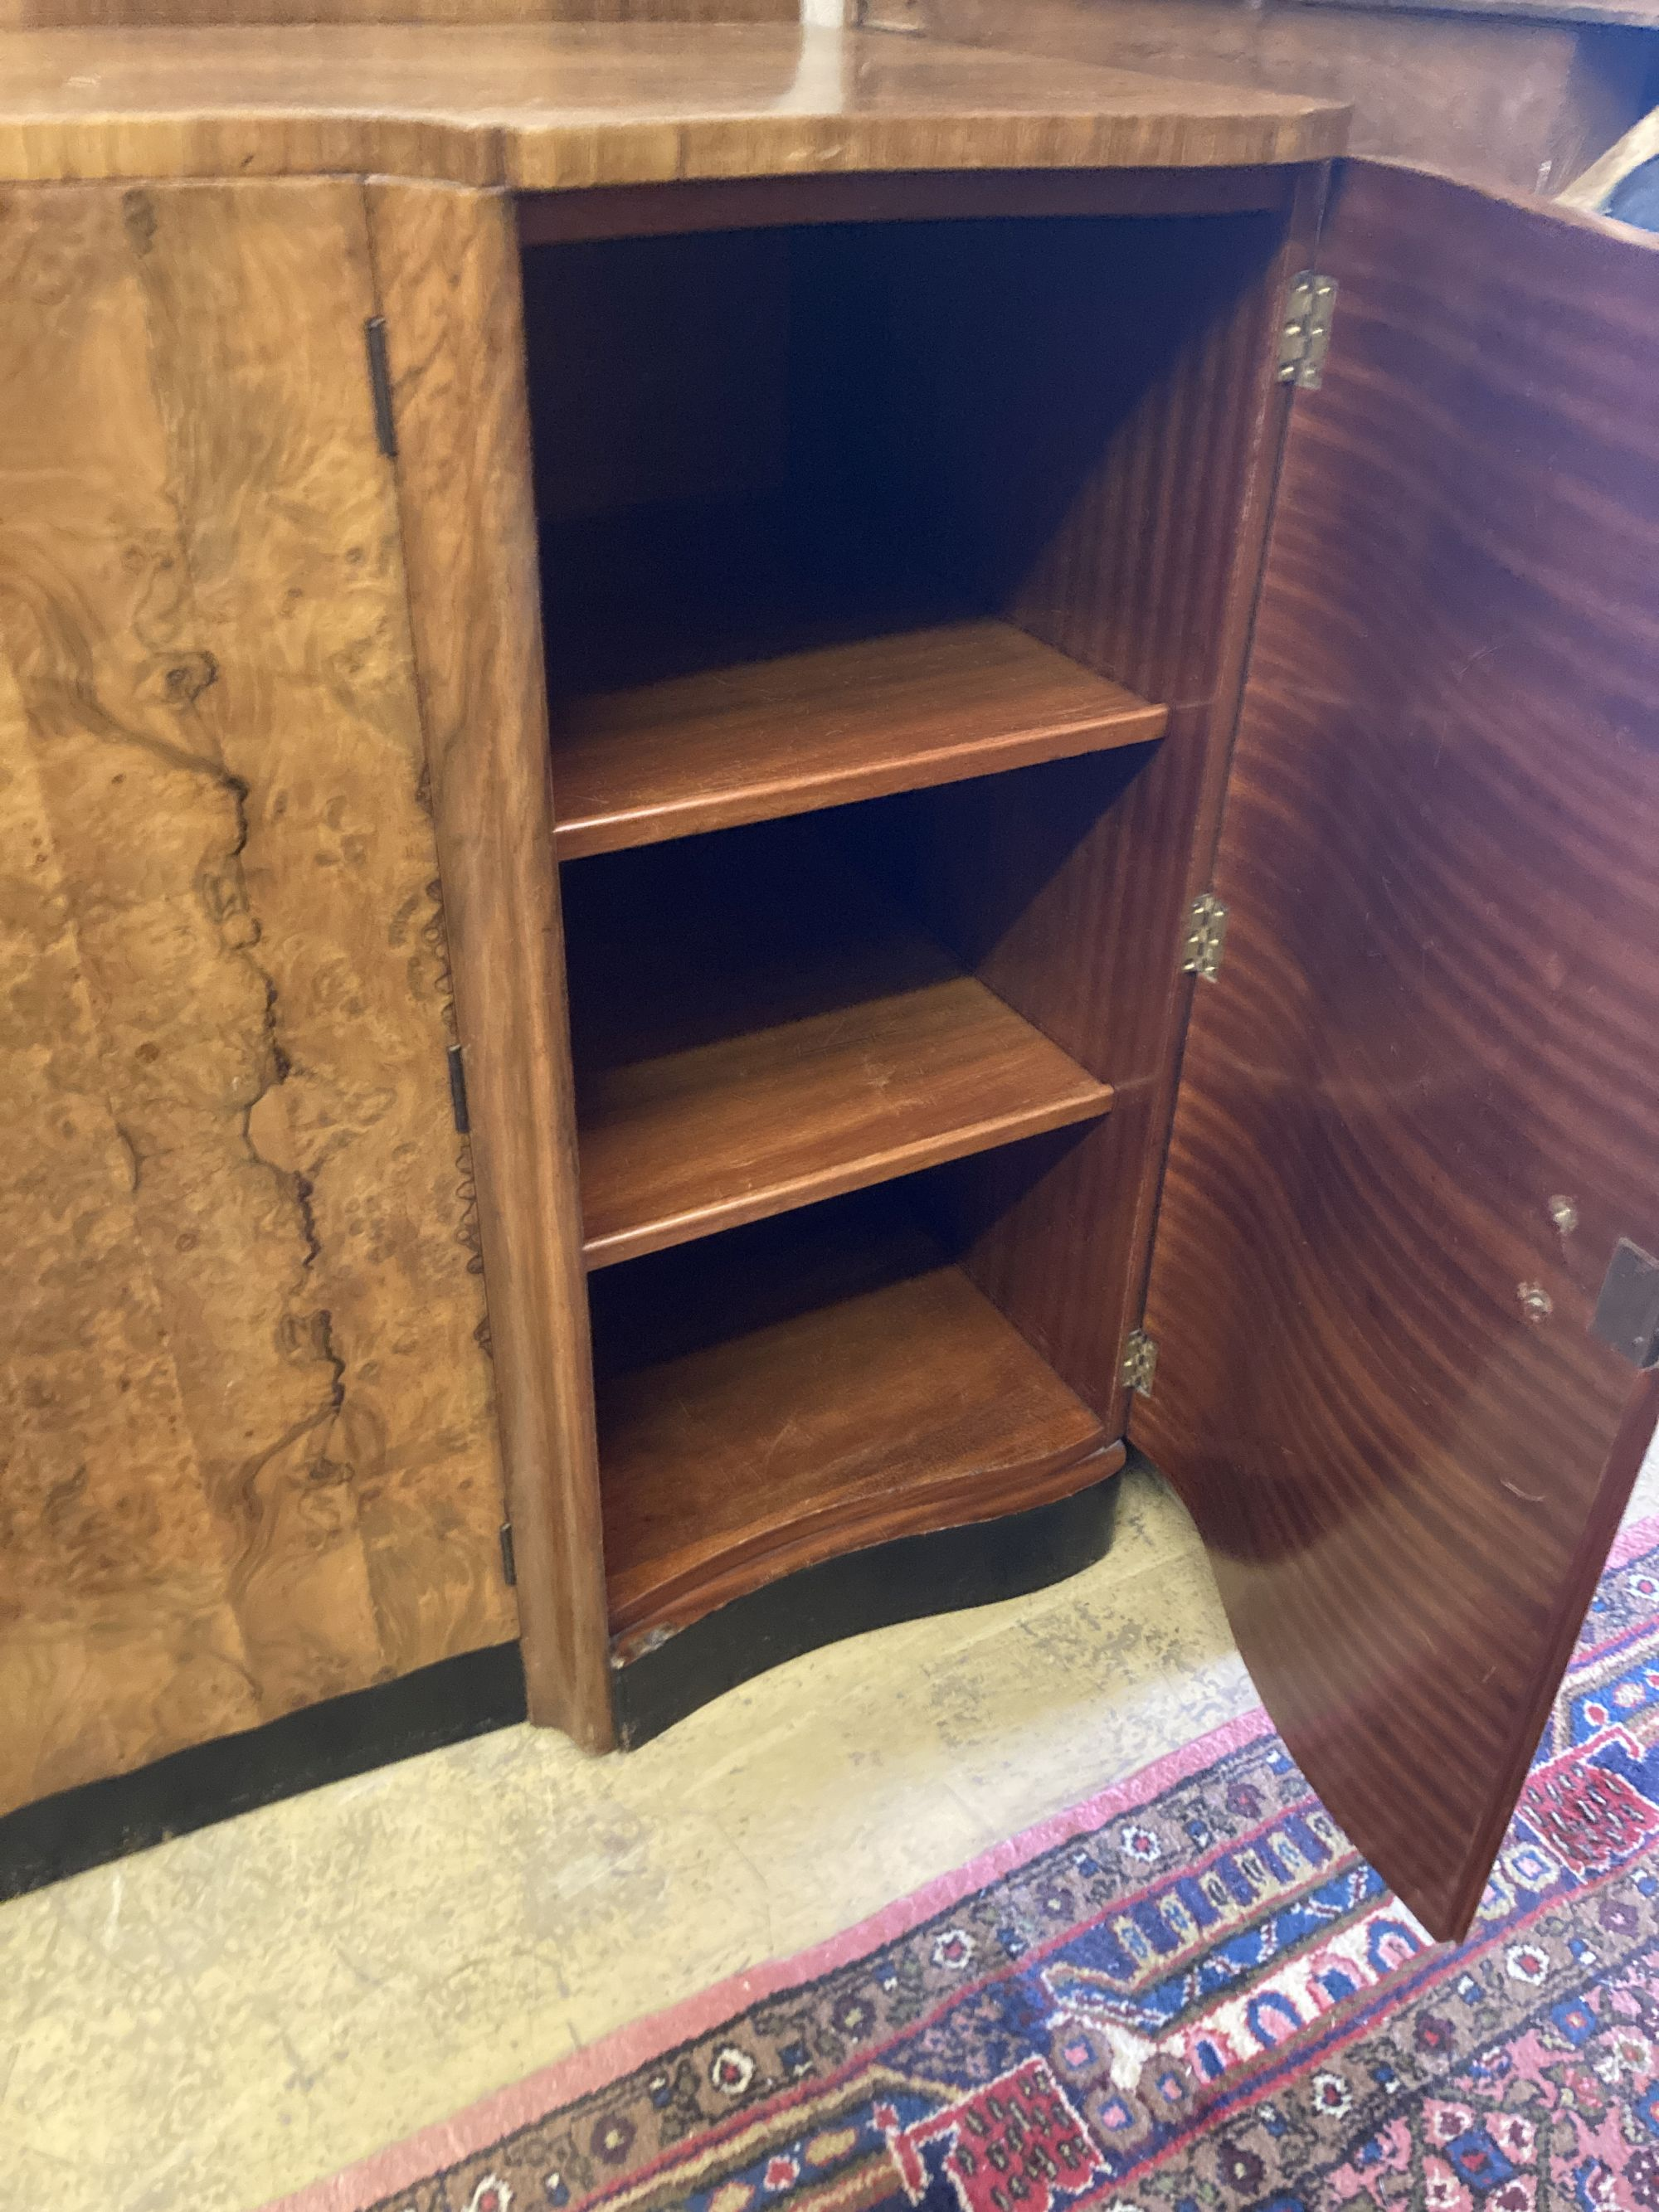 An Art Deco figured walnut sideboard, width 168cm depth 58cm height 98cm - Image 2 of 3